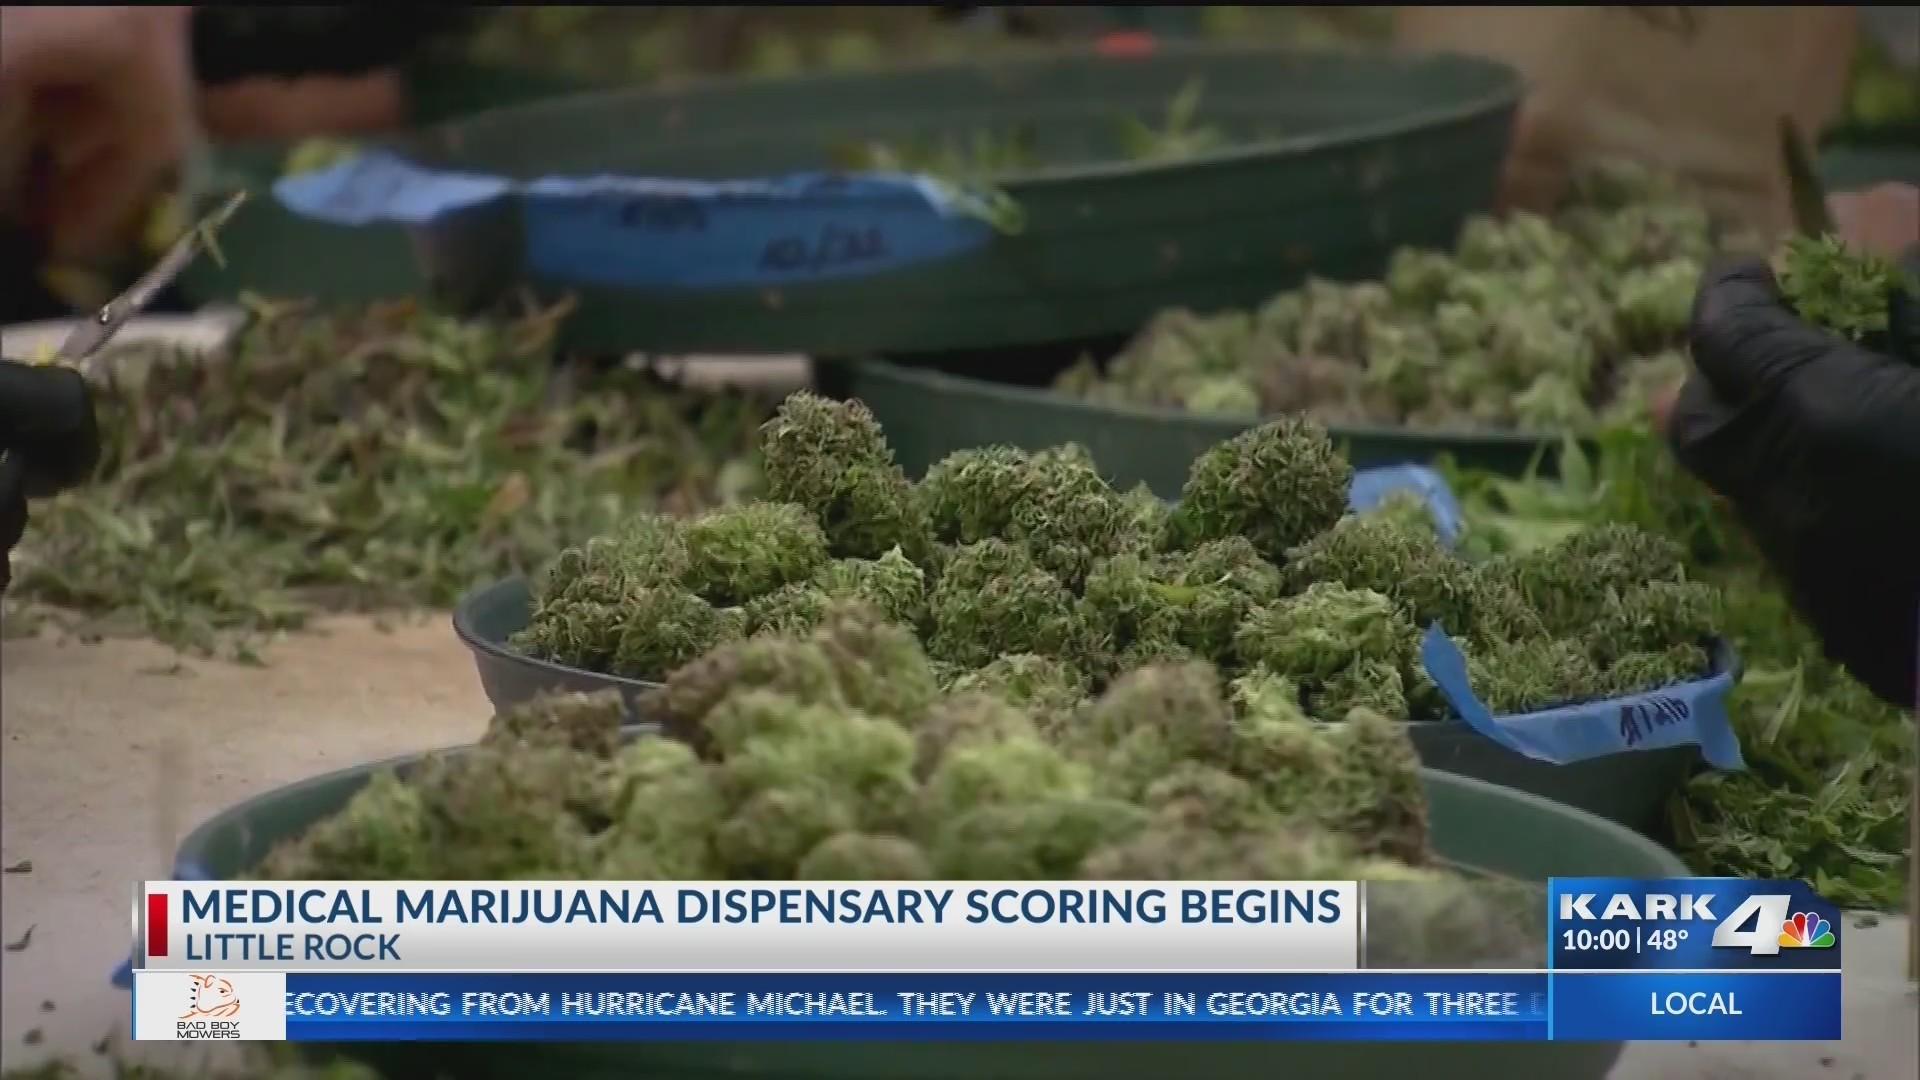 Medical_Marijuana_Dispensary_Scoring_Beg_0_20181017031543